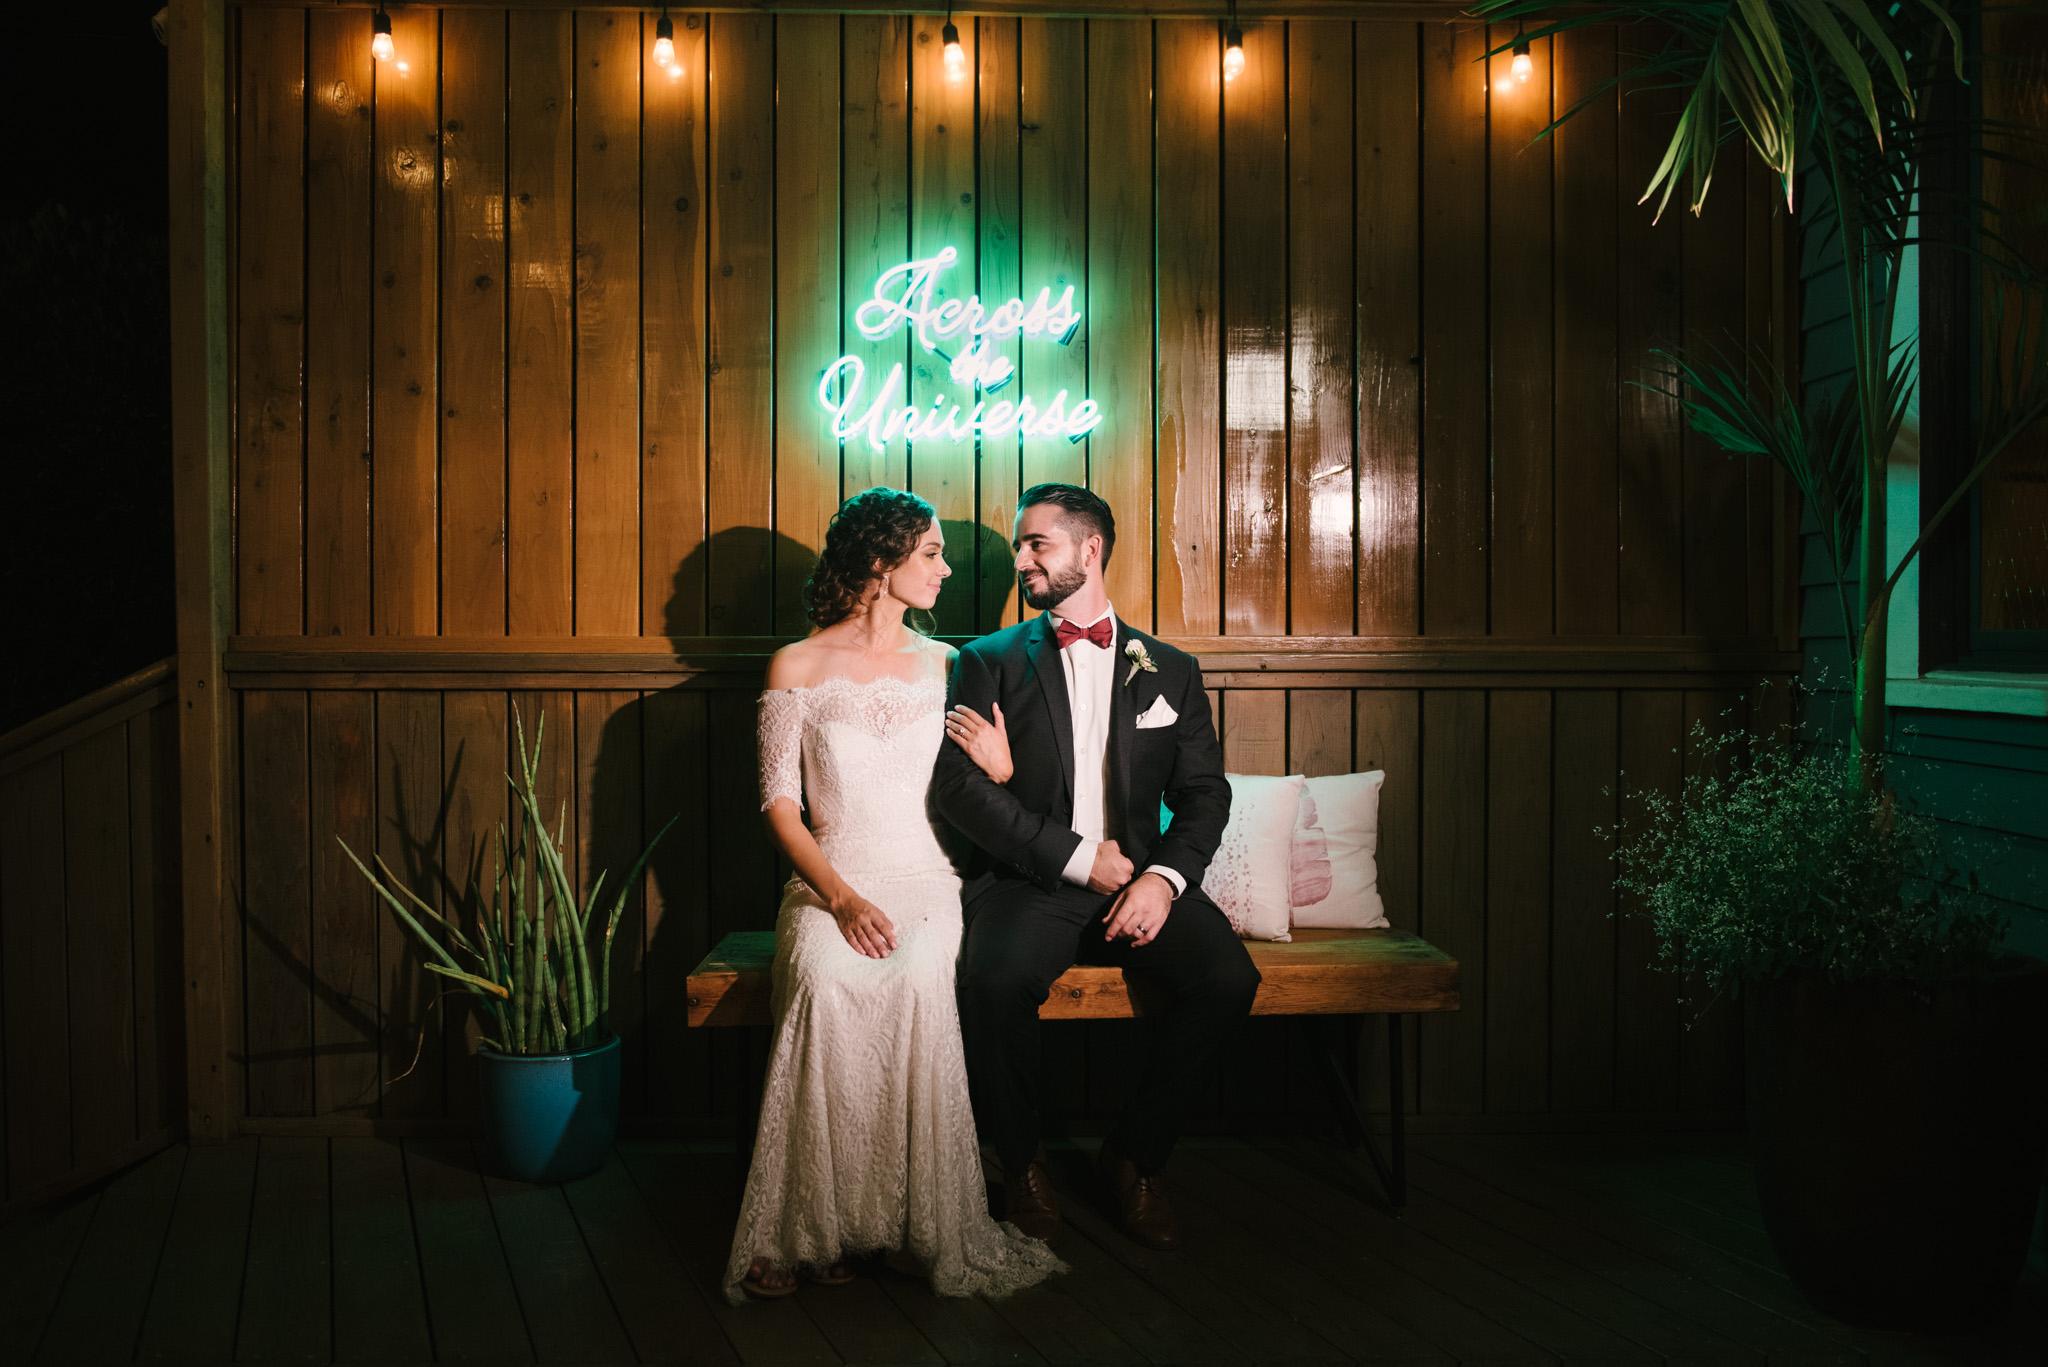 LJ-Ruby-Street-Los-Angeles-County-Wedding-Photography-Teaser-21.jpg